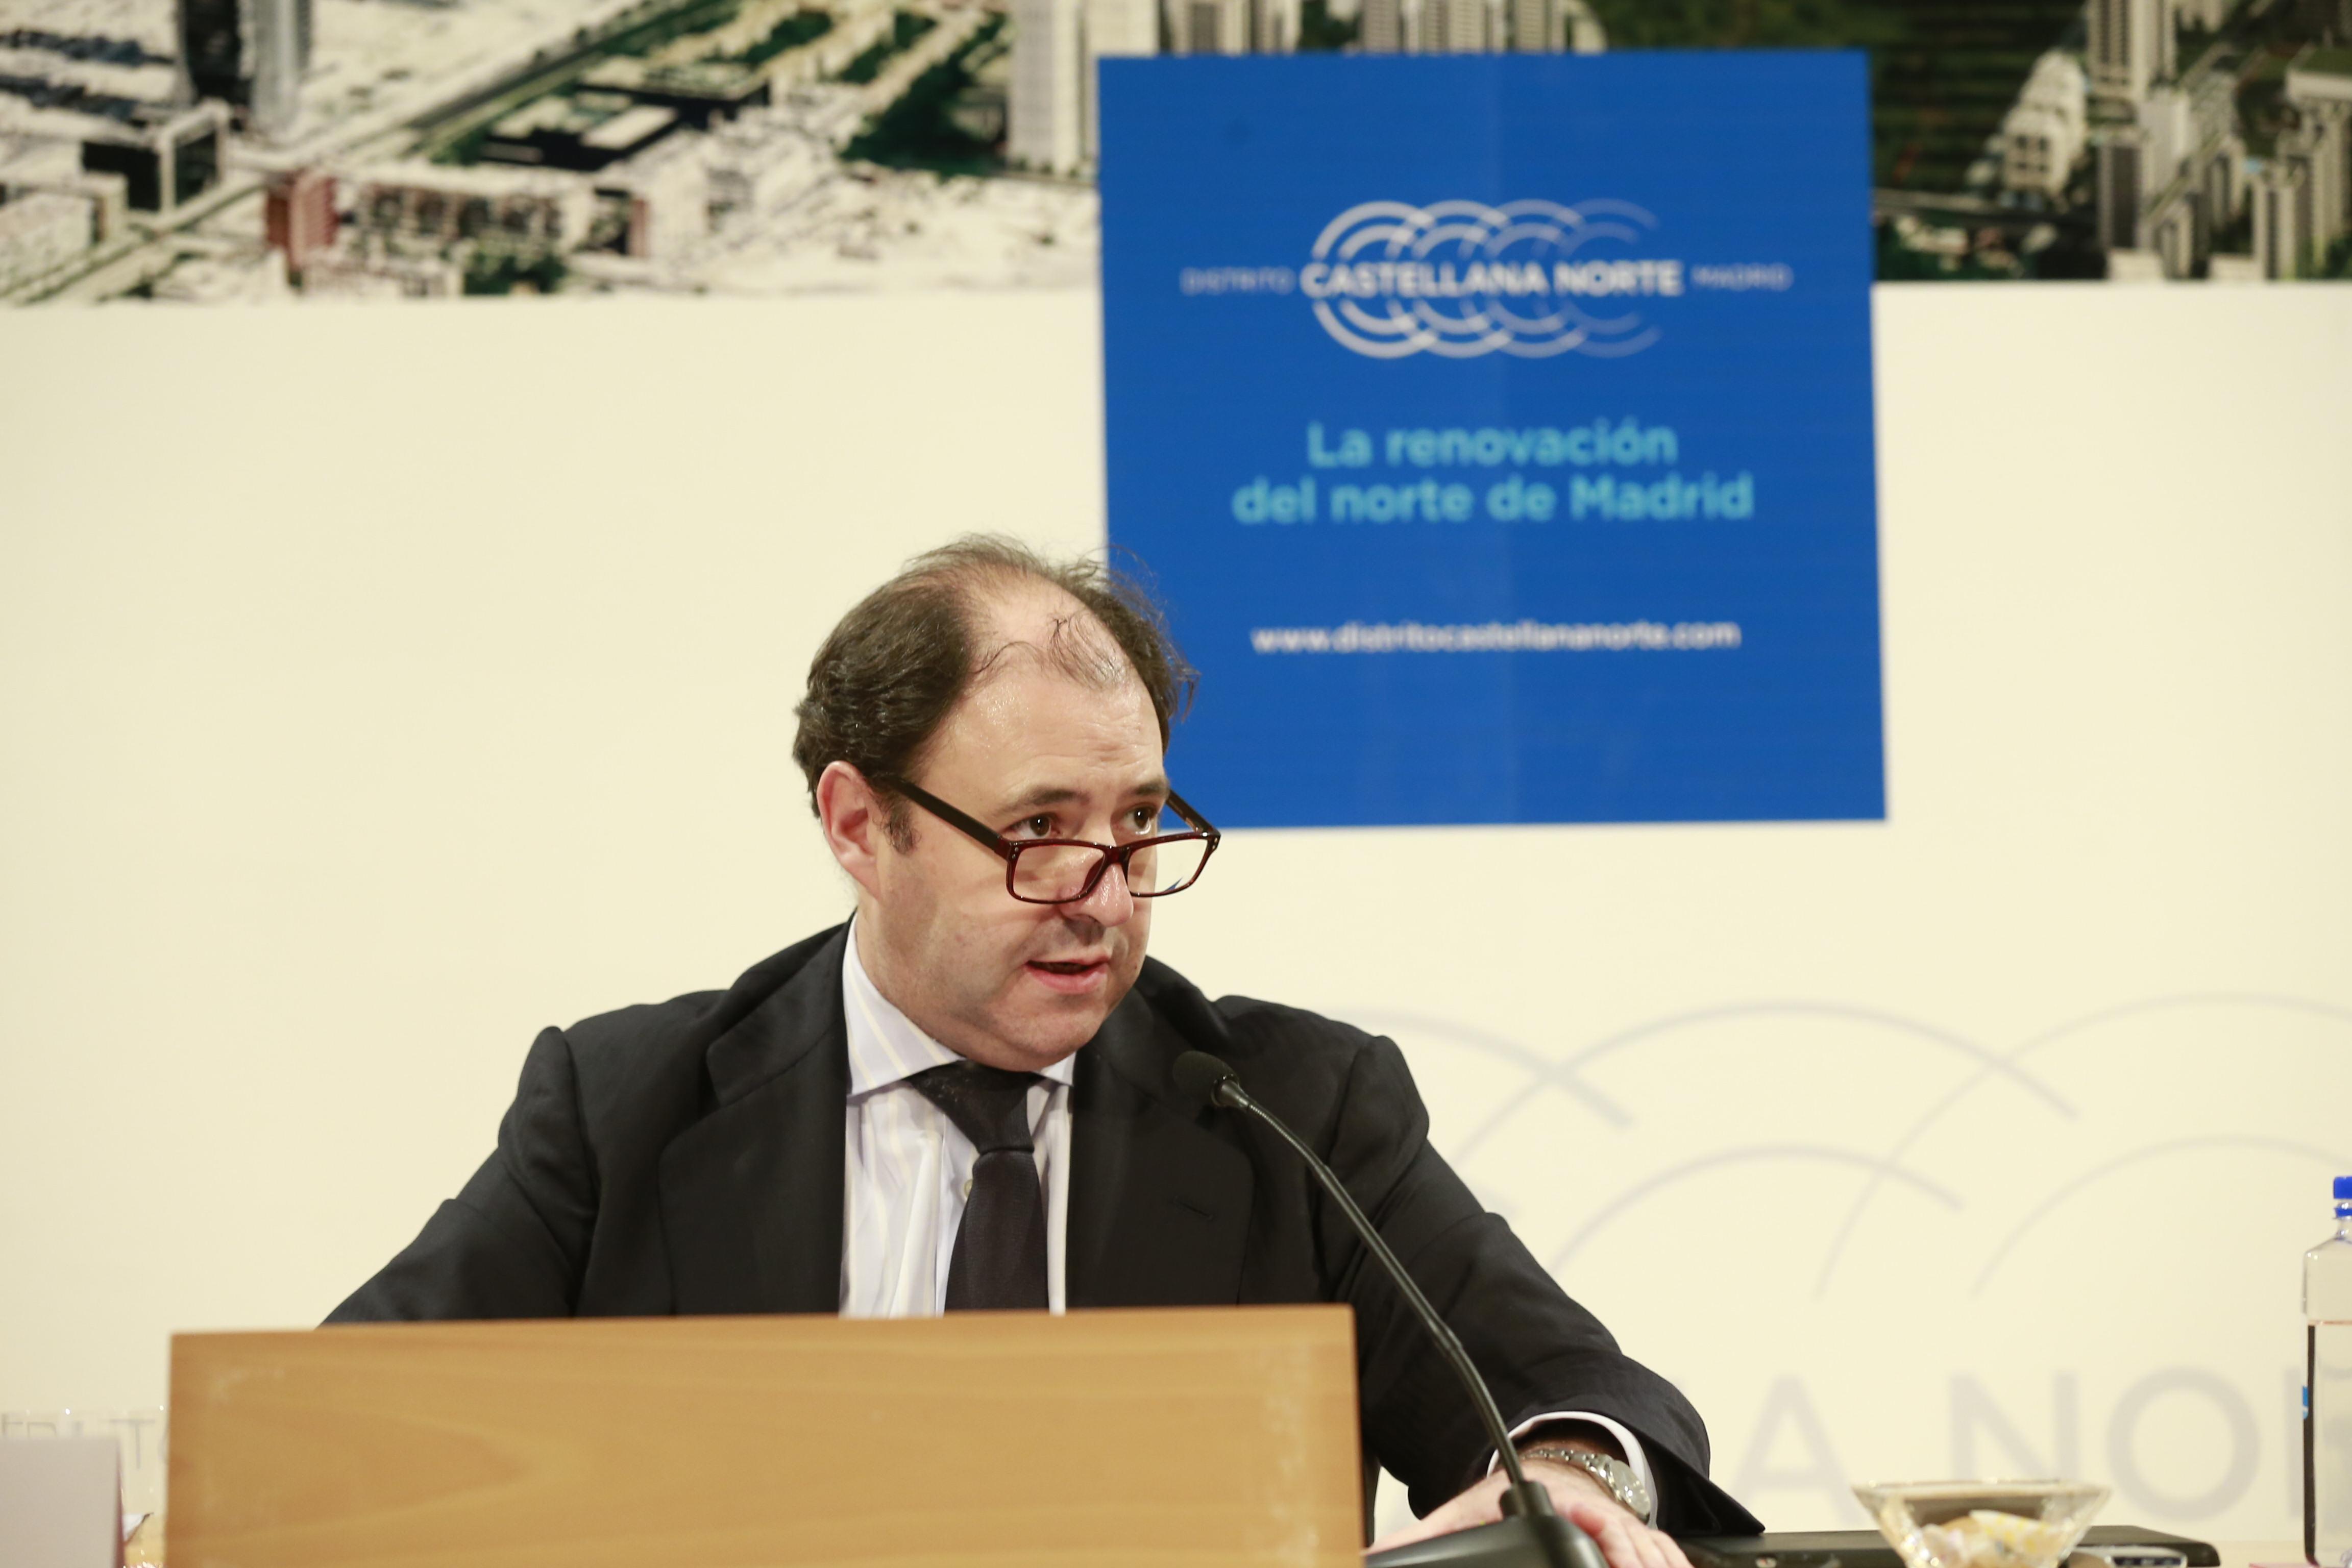 Antonio Béjar, presidente de Distrito Castellana Norte